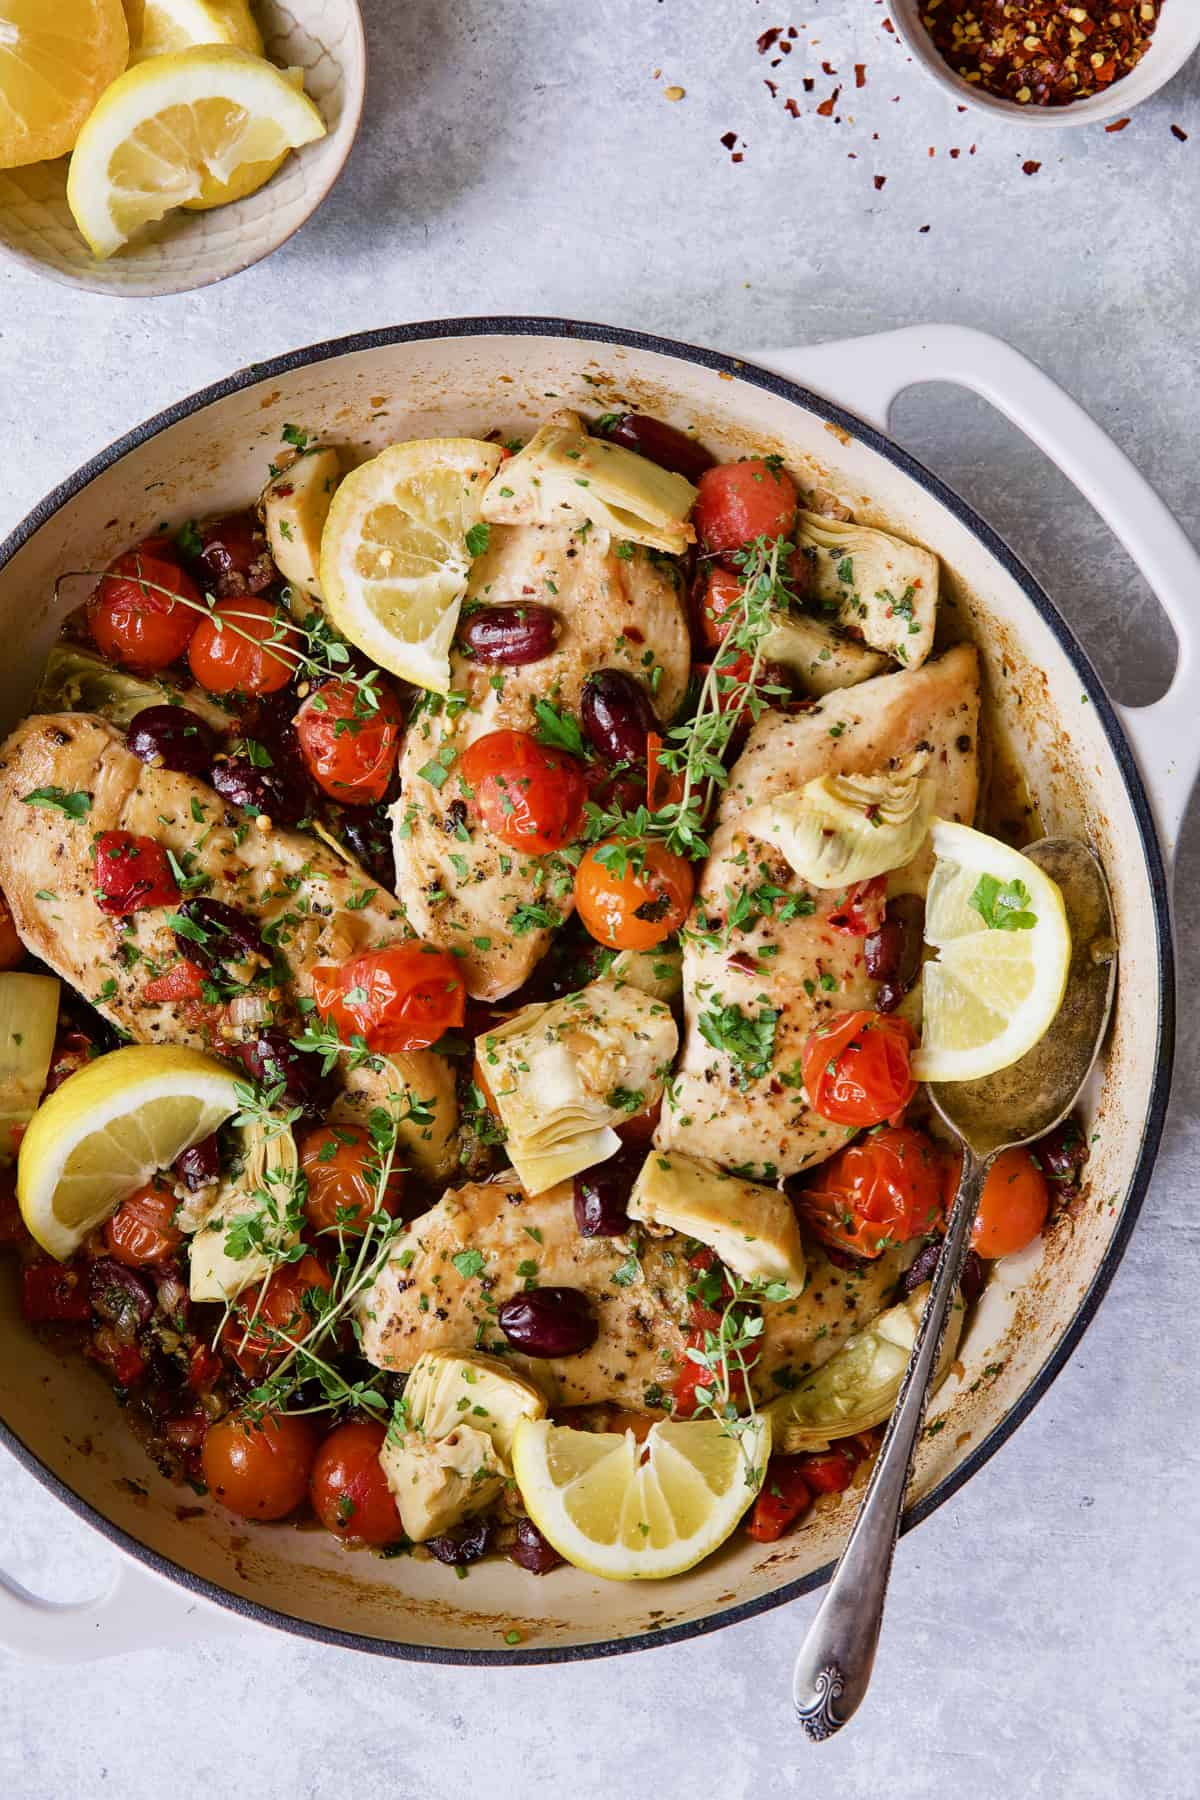 Easy Skillet Mediterranean Chicken in white enamel cast iron skillet garnished with fresh thyme and lemon wedges.